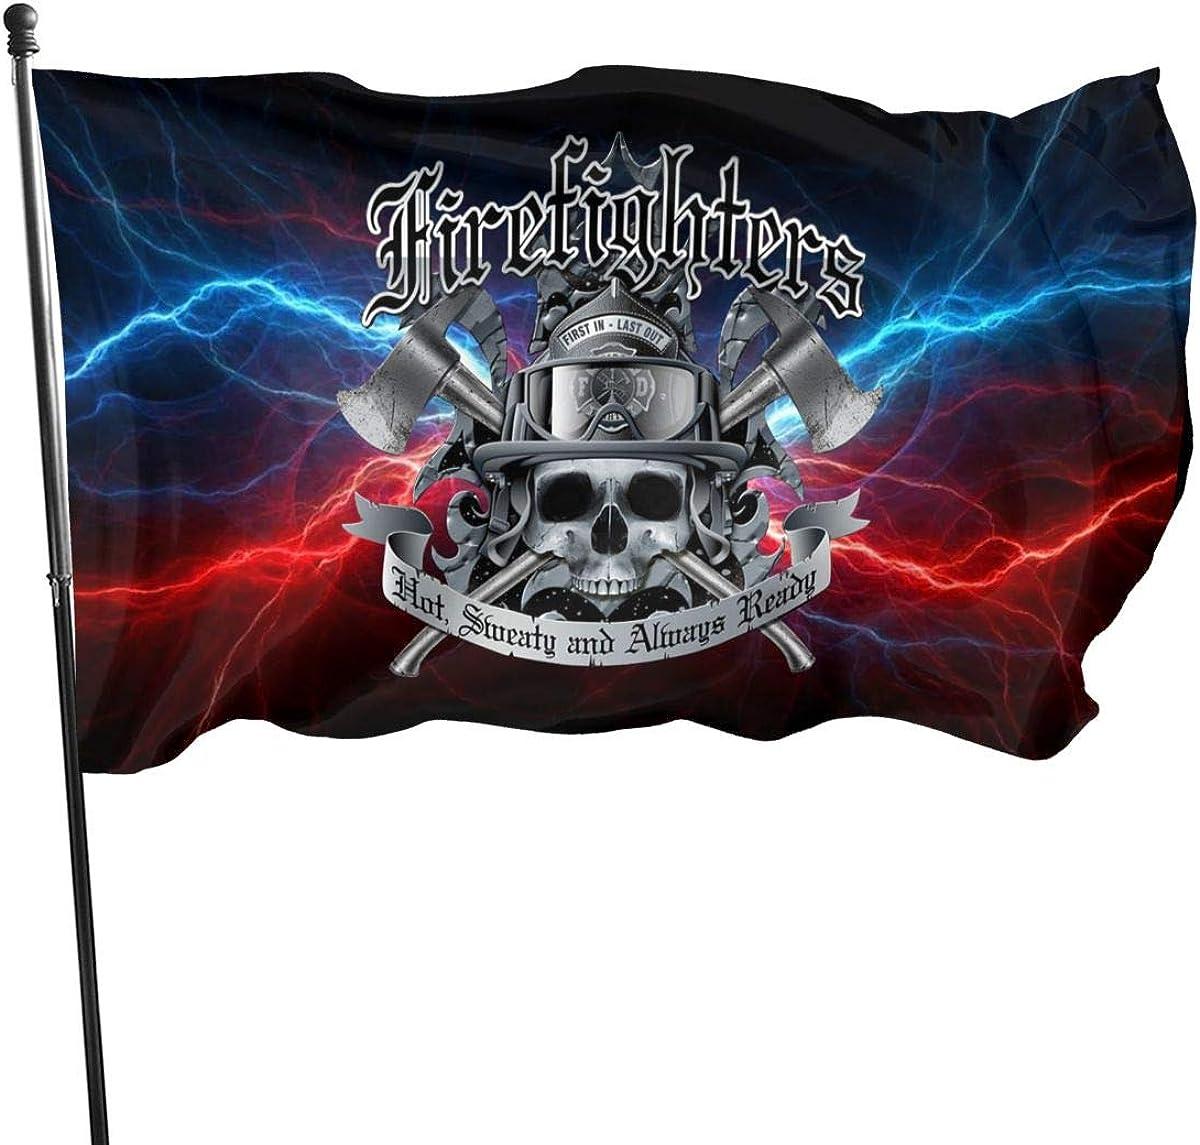 Firefighters Ready 3x5 FT American Flag, Outdoor Banner, Family Banner, Garden Banner Black